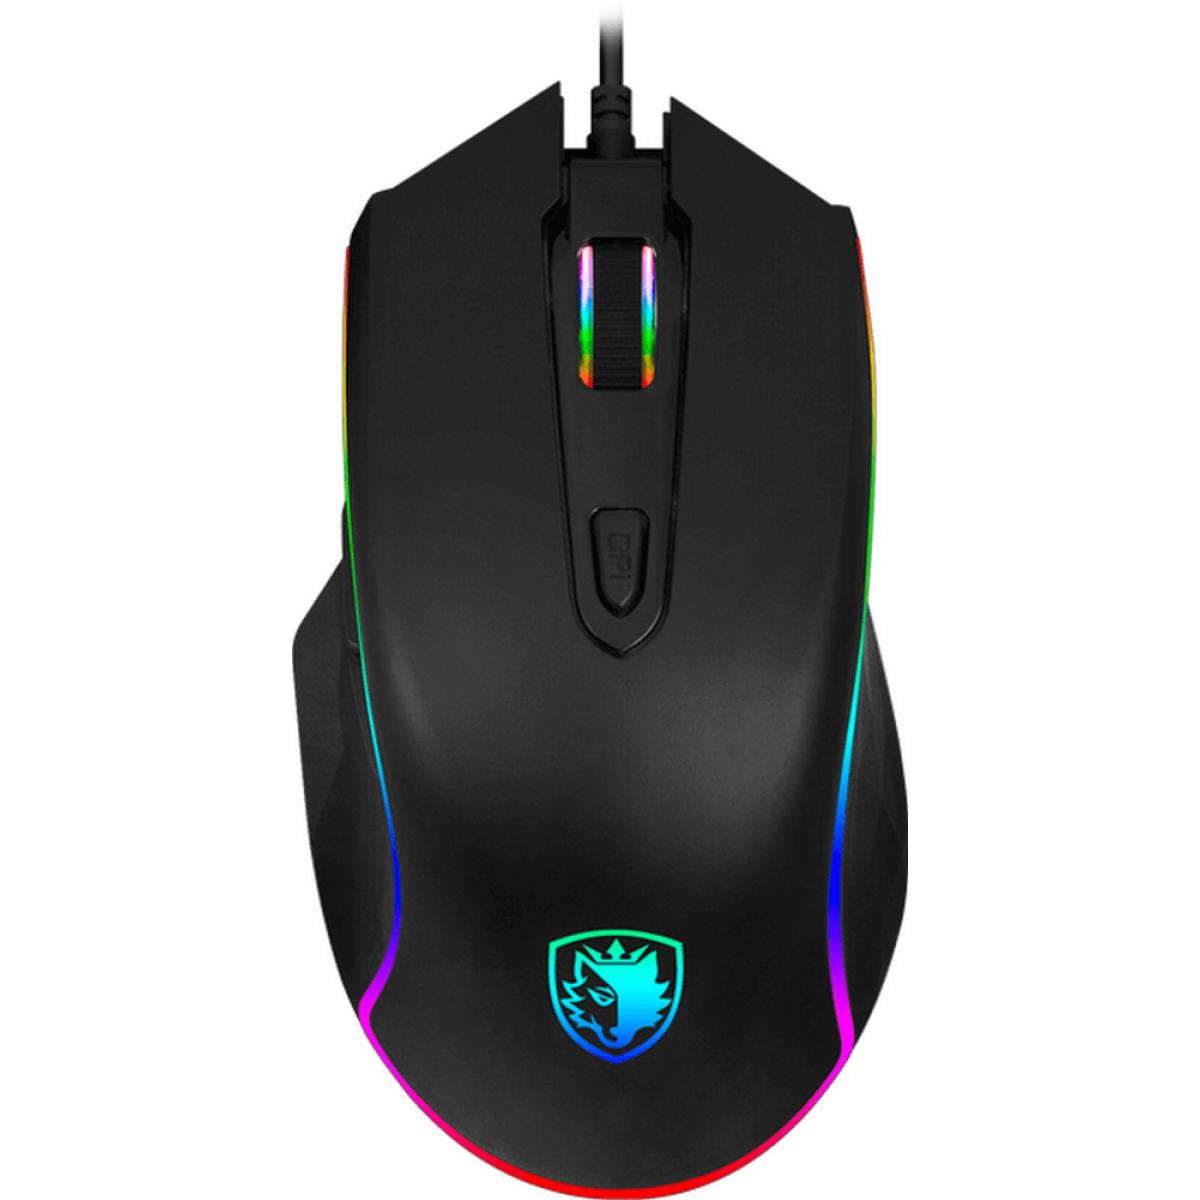 Mouse Gamer Sades S17 Scythe RGB, 4000 DPI, 7 Botões, Black